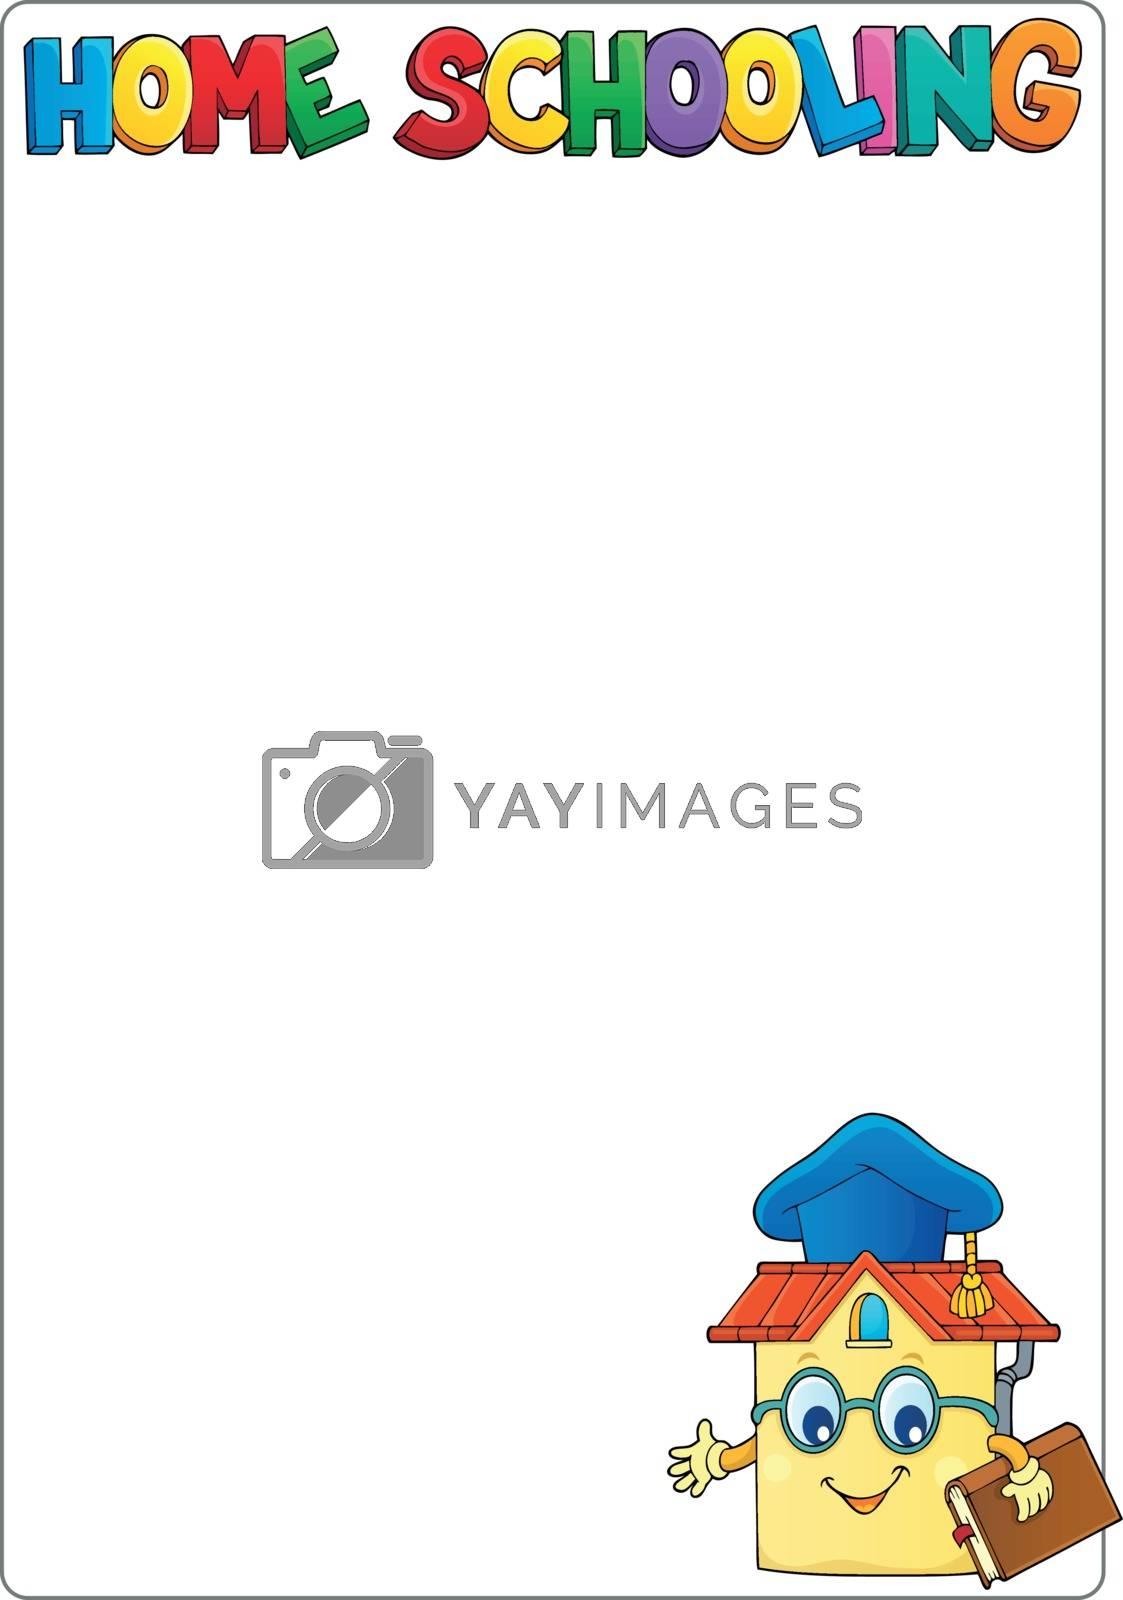 Home schooling theme frame 1 - eps10 vector illustration.